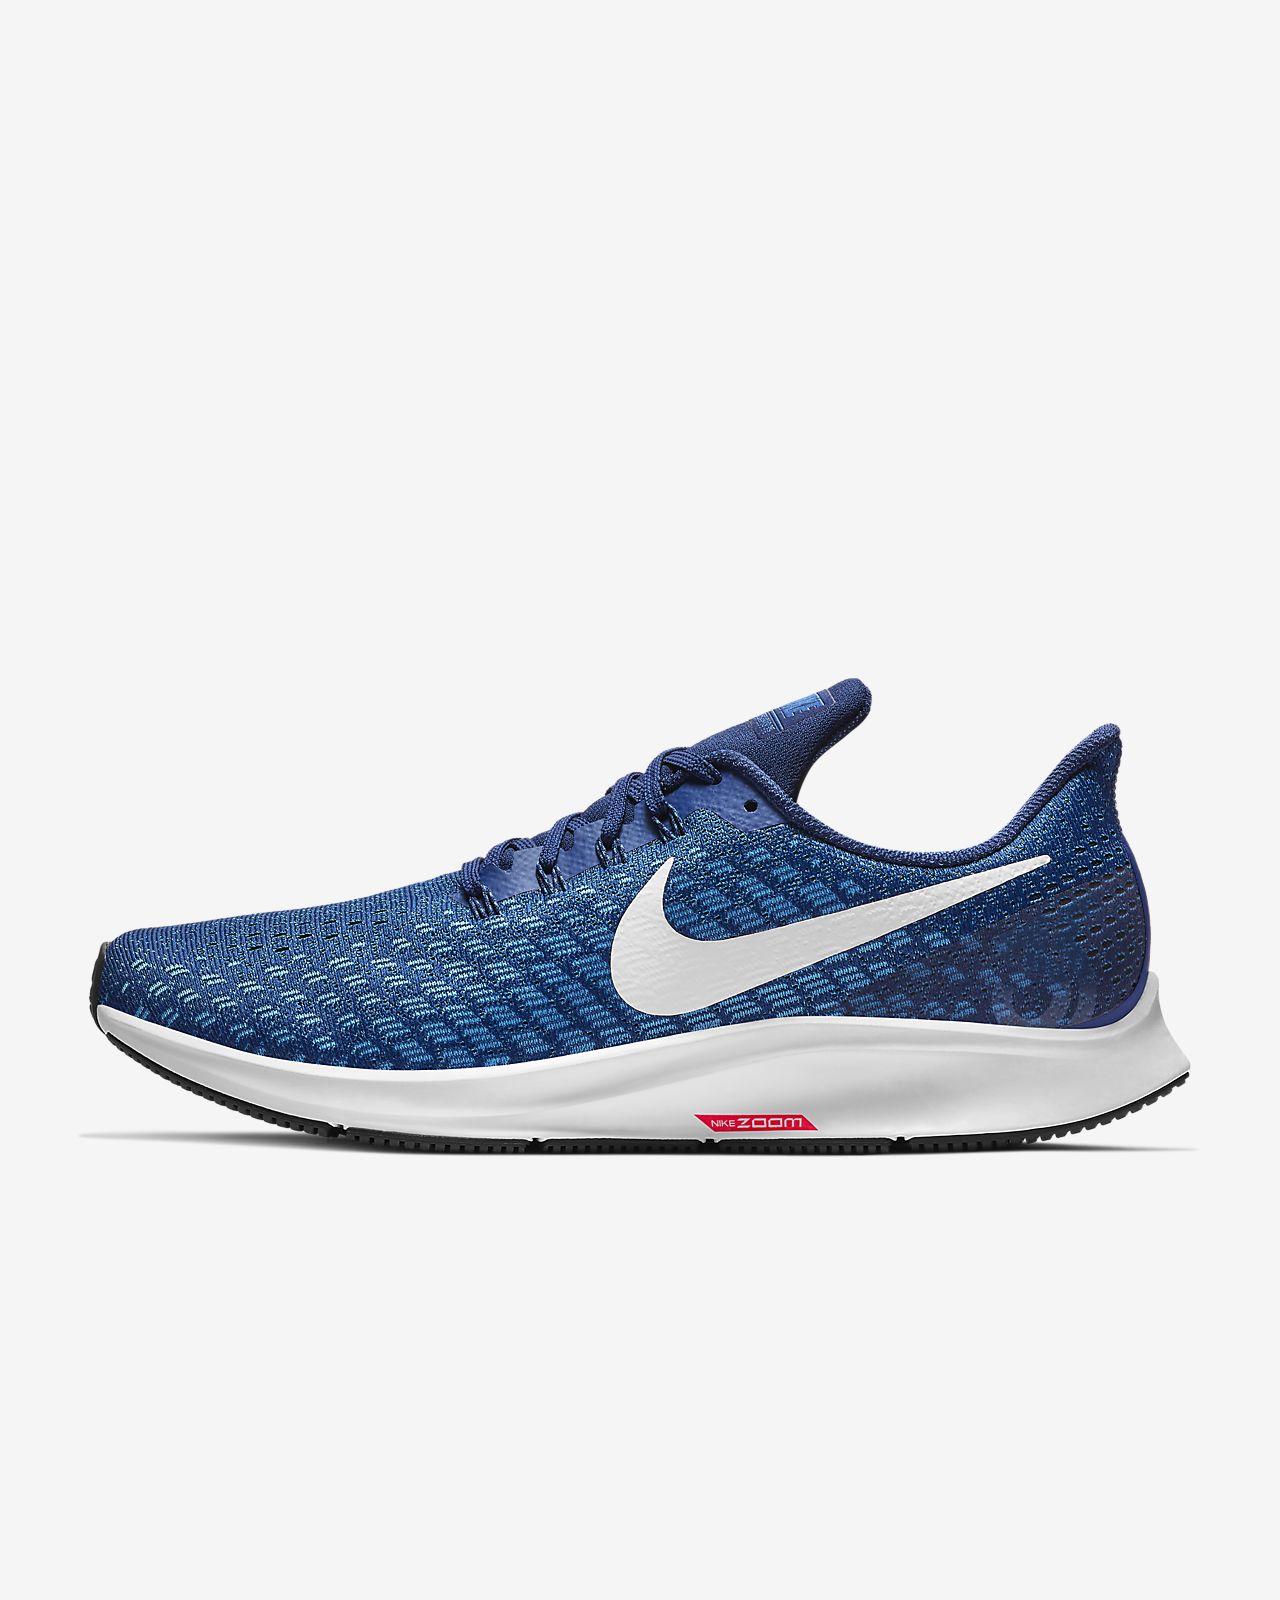 c2427a0a803 Ανδρικό παπούτσι για τρέξιμο Nike Air Zoom Pegasus 35. Nike.com GR